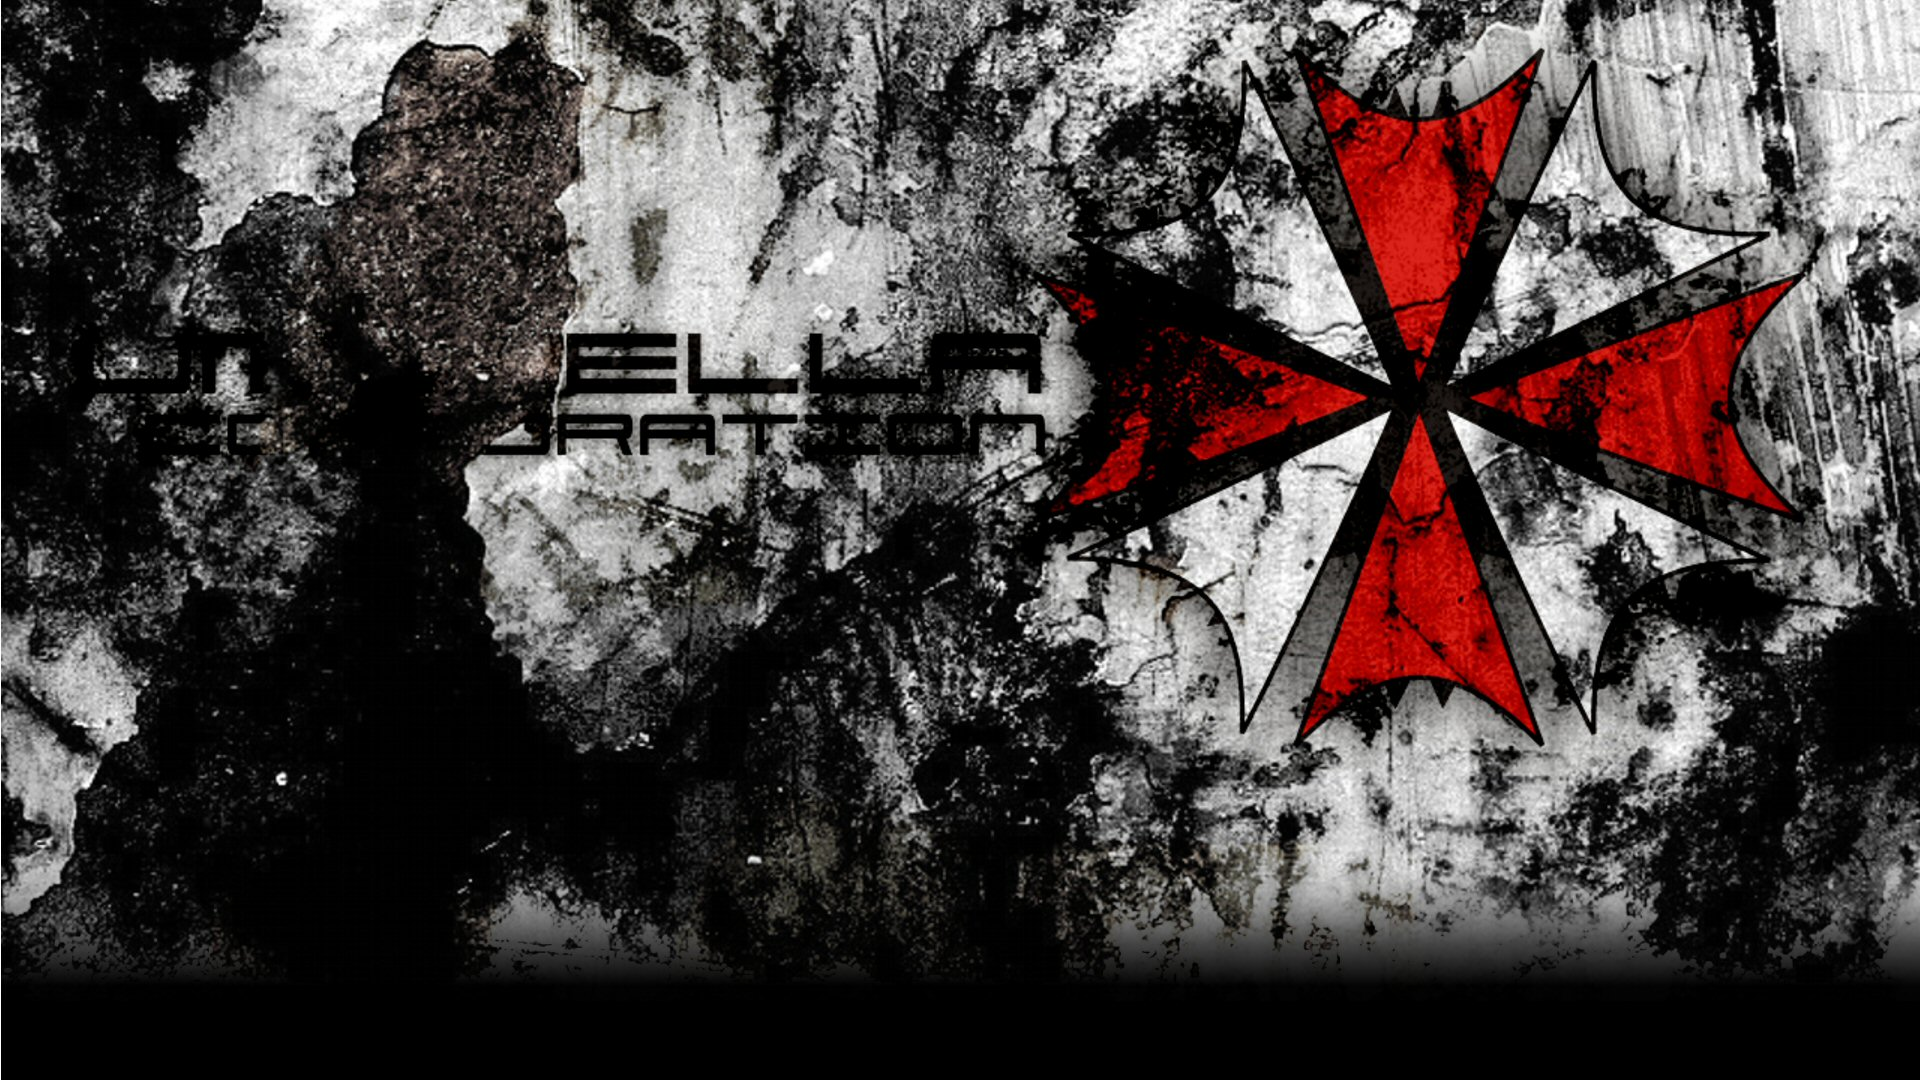 Resident Evil Wallpaper Umbrella wallpaper   277990 1920x1080